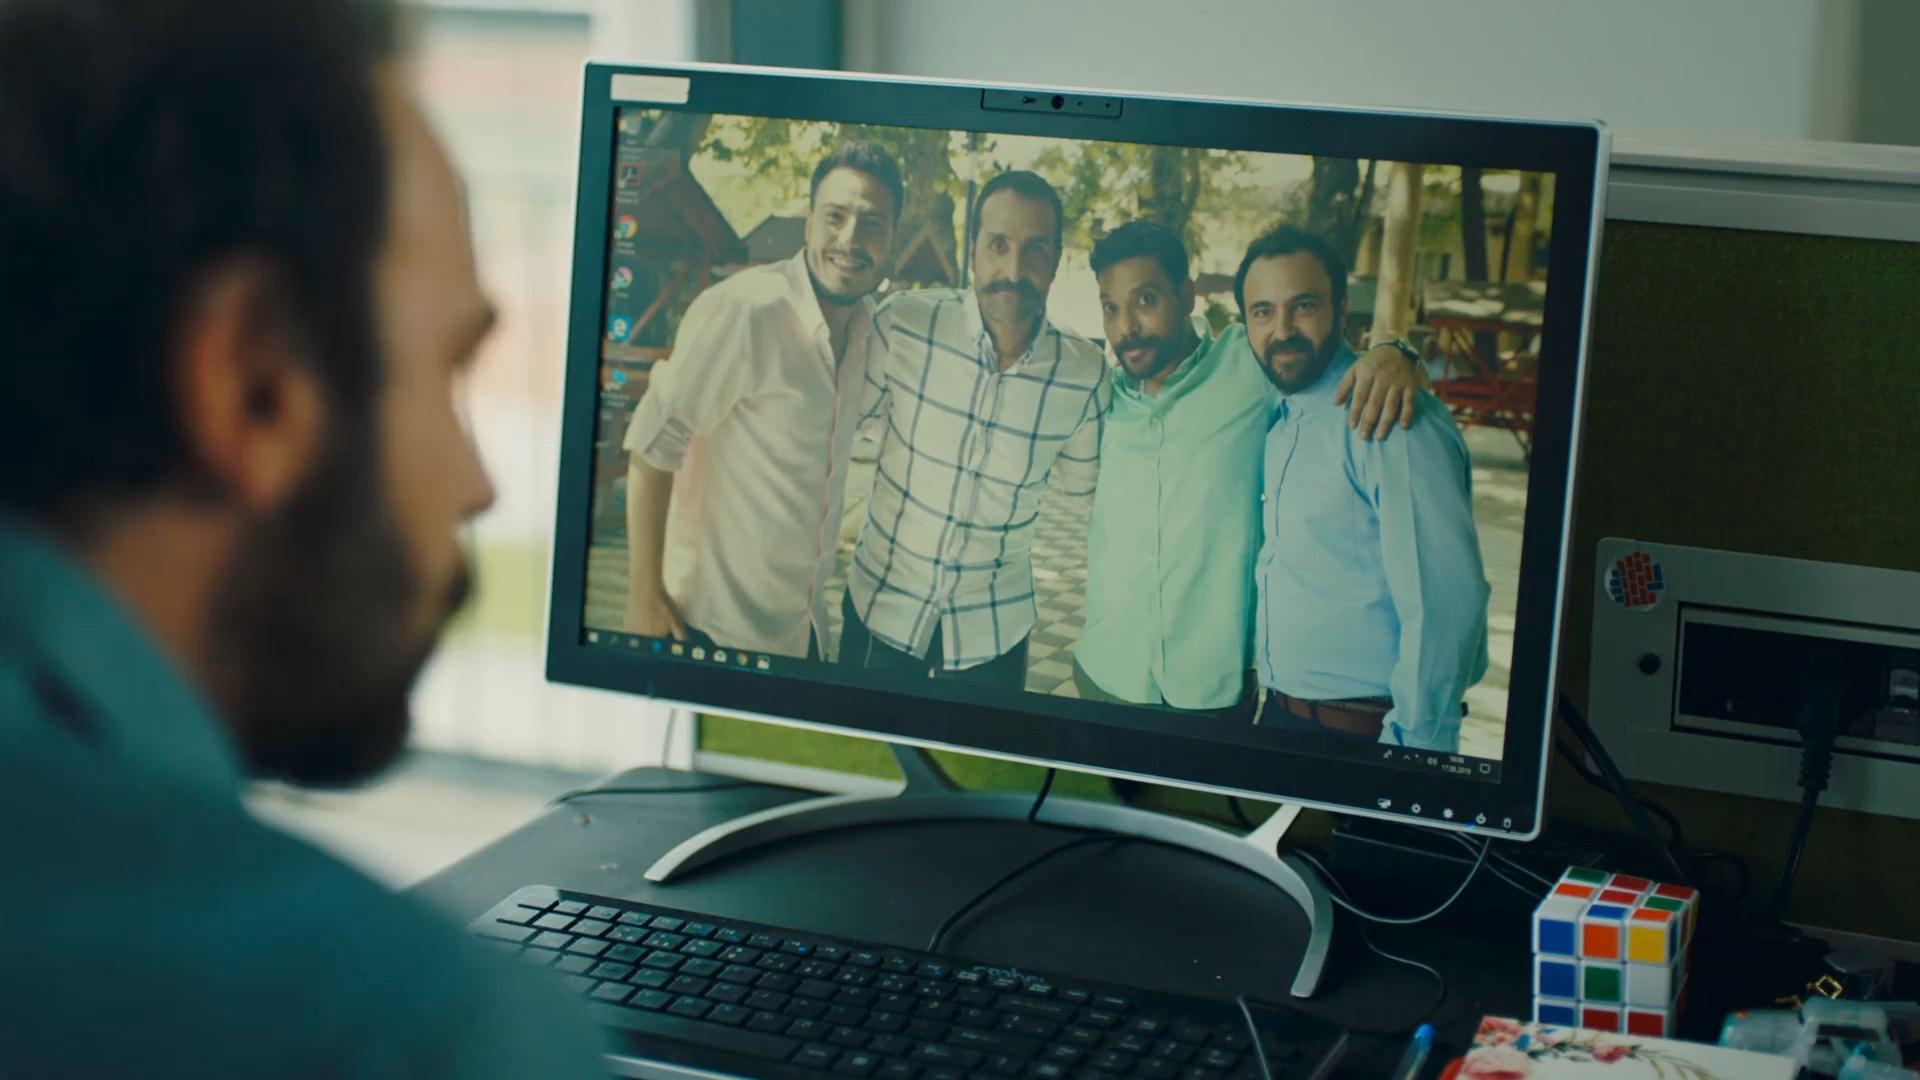 Kırk Yalan | 2020 | Yerli Film | NF | WEB-DL | XviD | Sansürsüz | 720p - 1080p - m720p - m1080p | WEB-DL | Tek Link